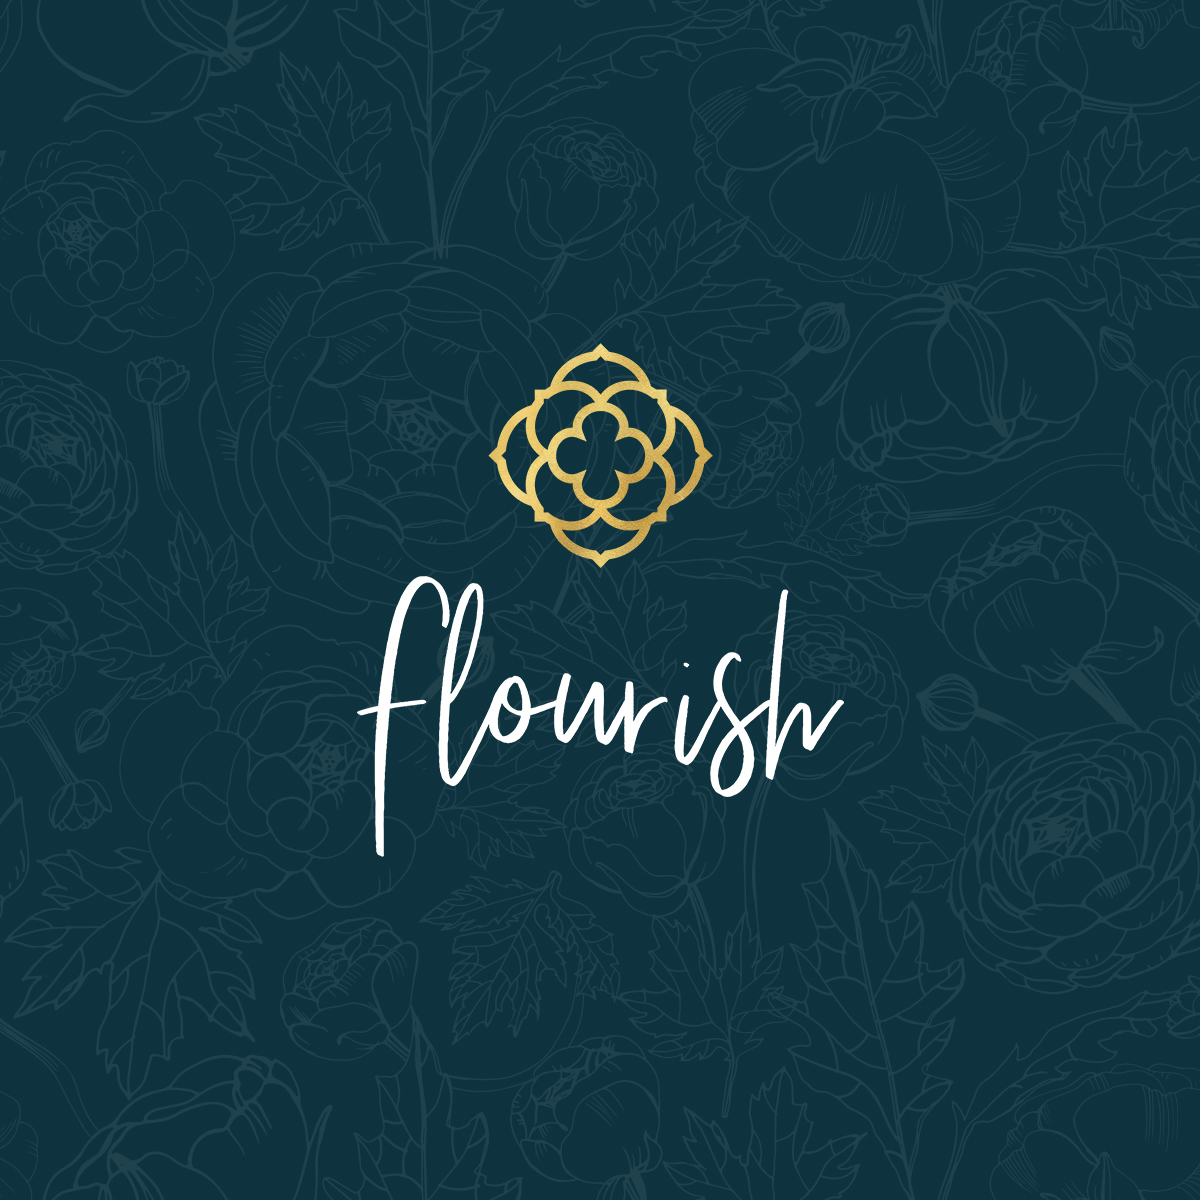 Flourish Boston